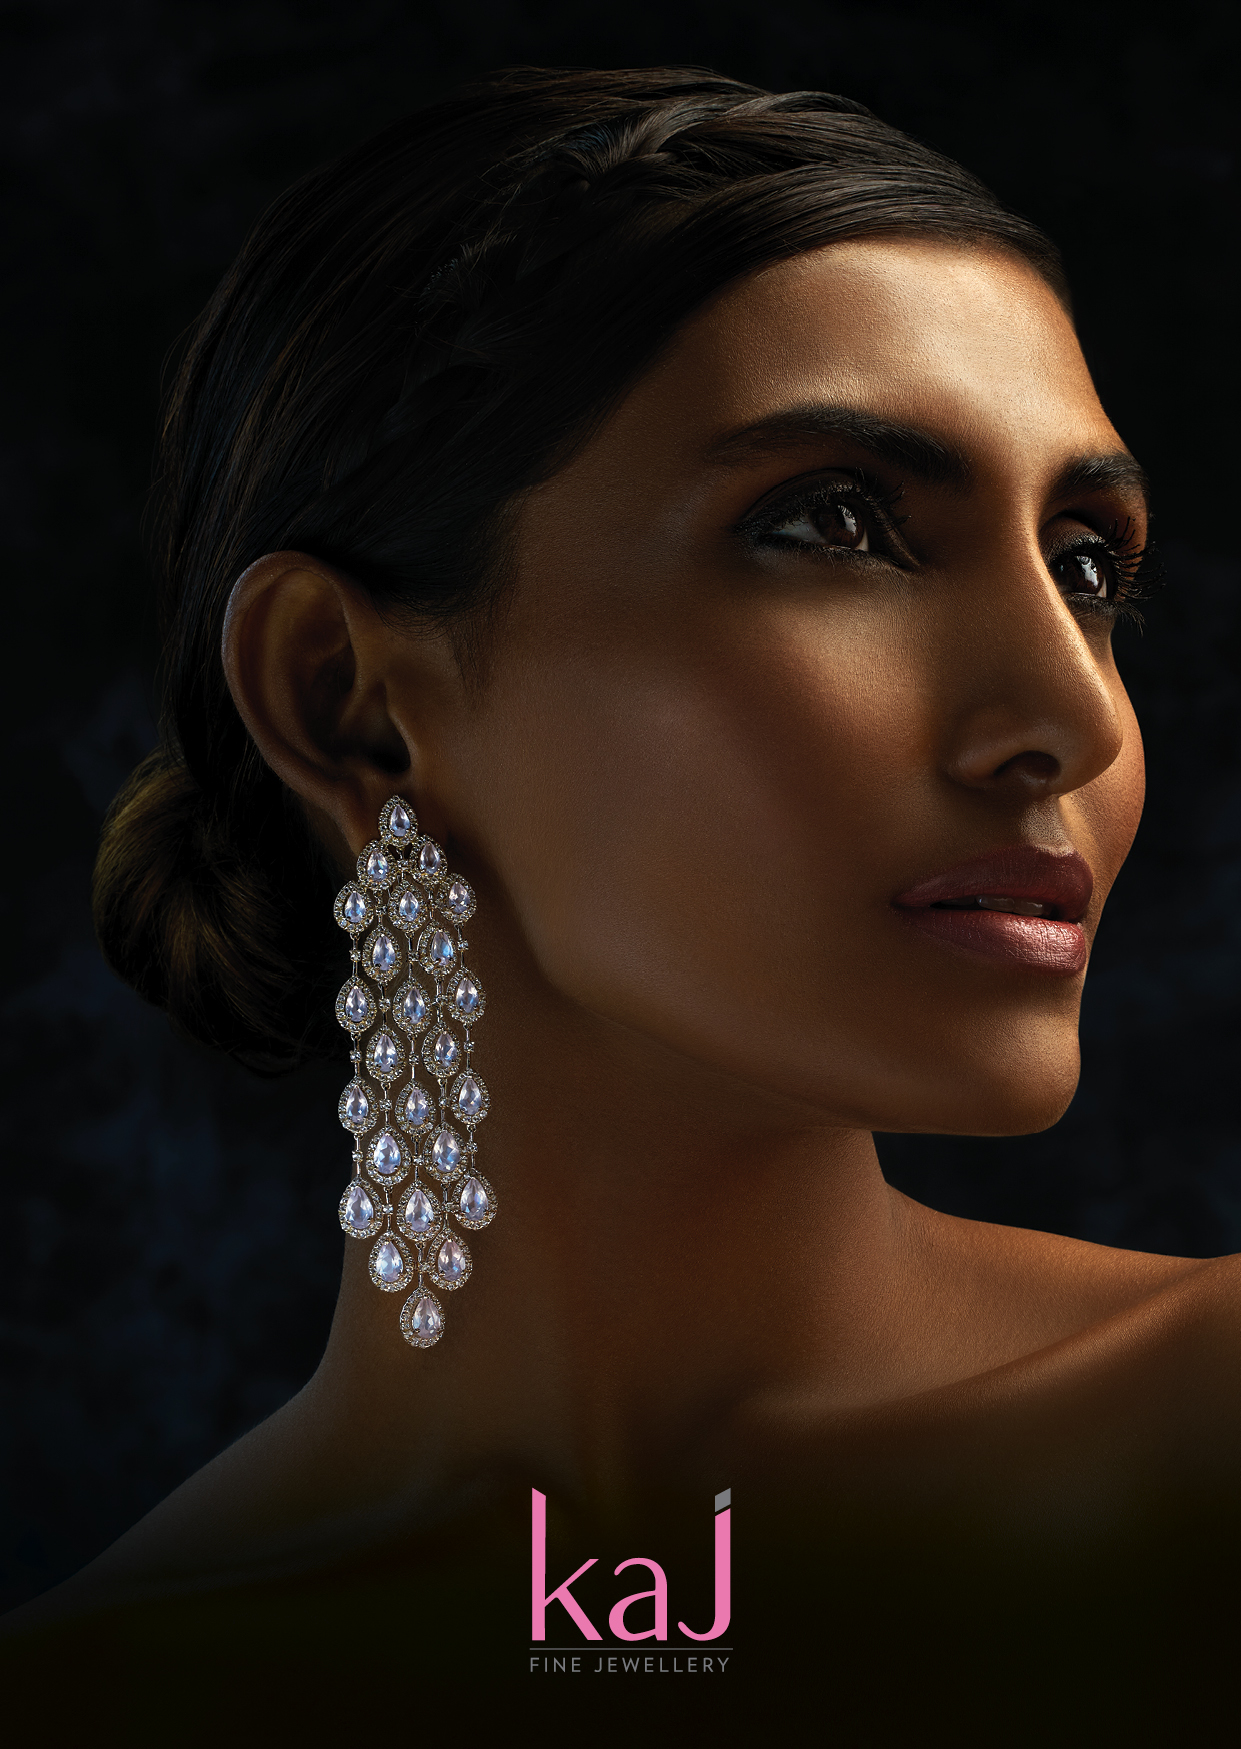 KAJ jewellery